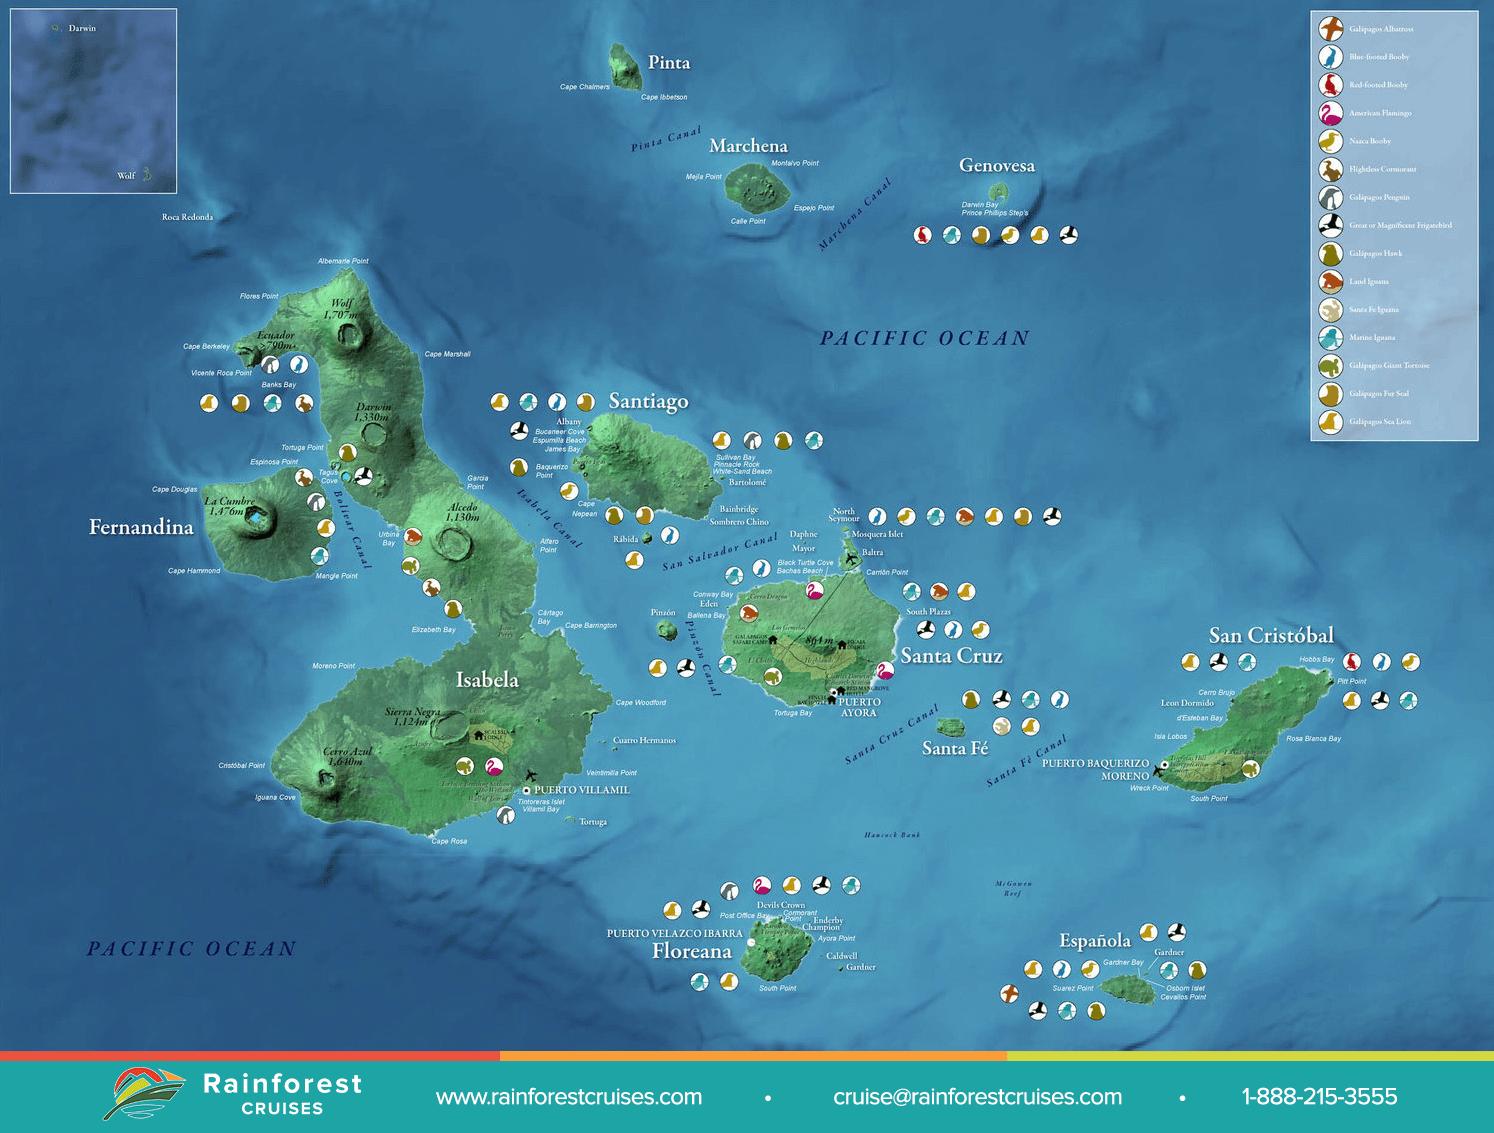 Galapagos Map Rainforest Cruises